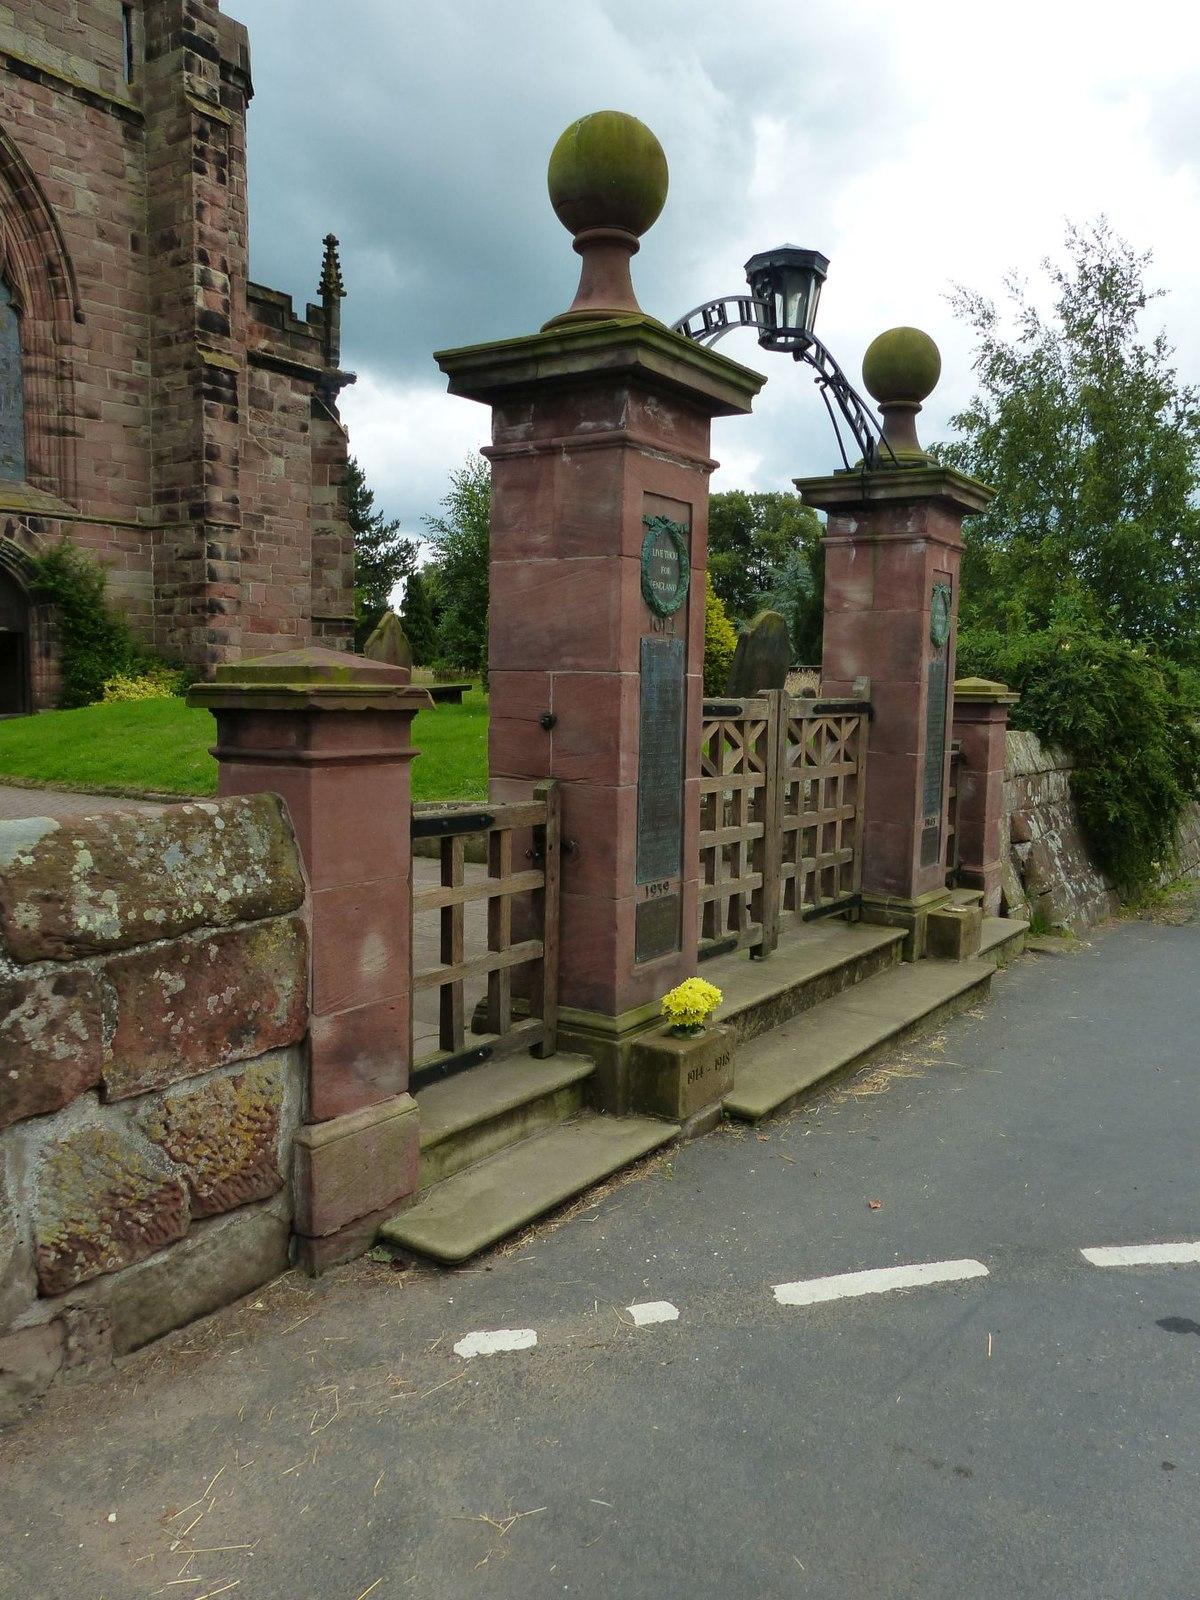 West gates to St Boniface Church, Bunbury, Cheshire.jpg